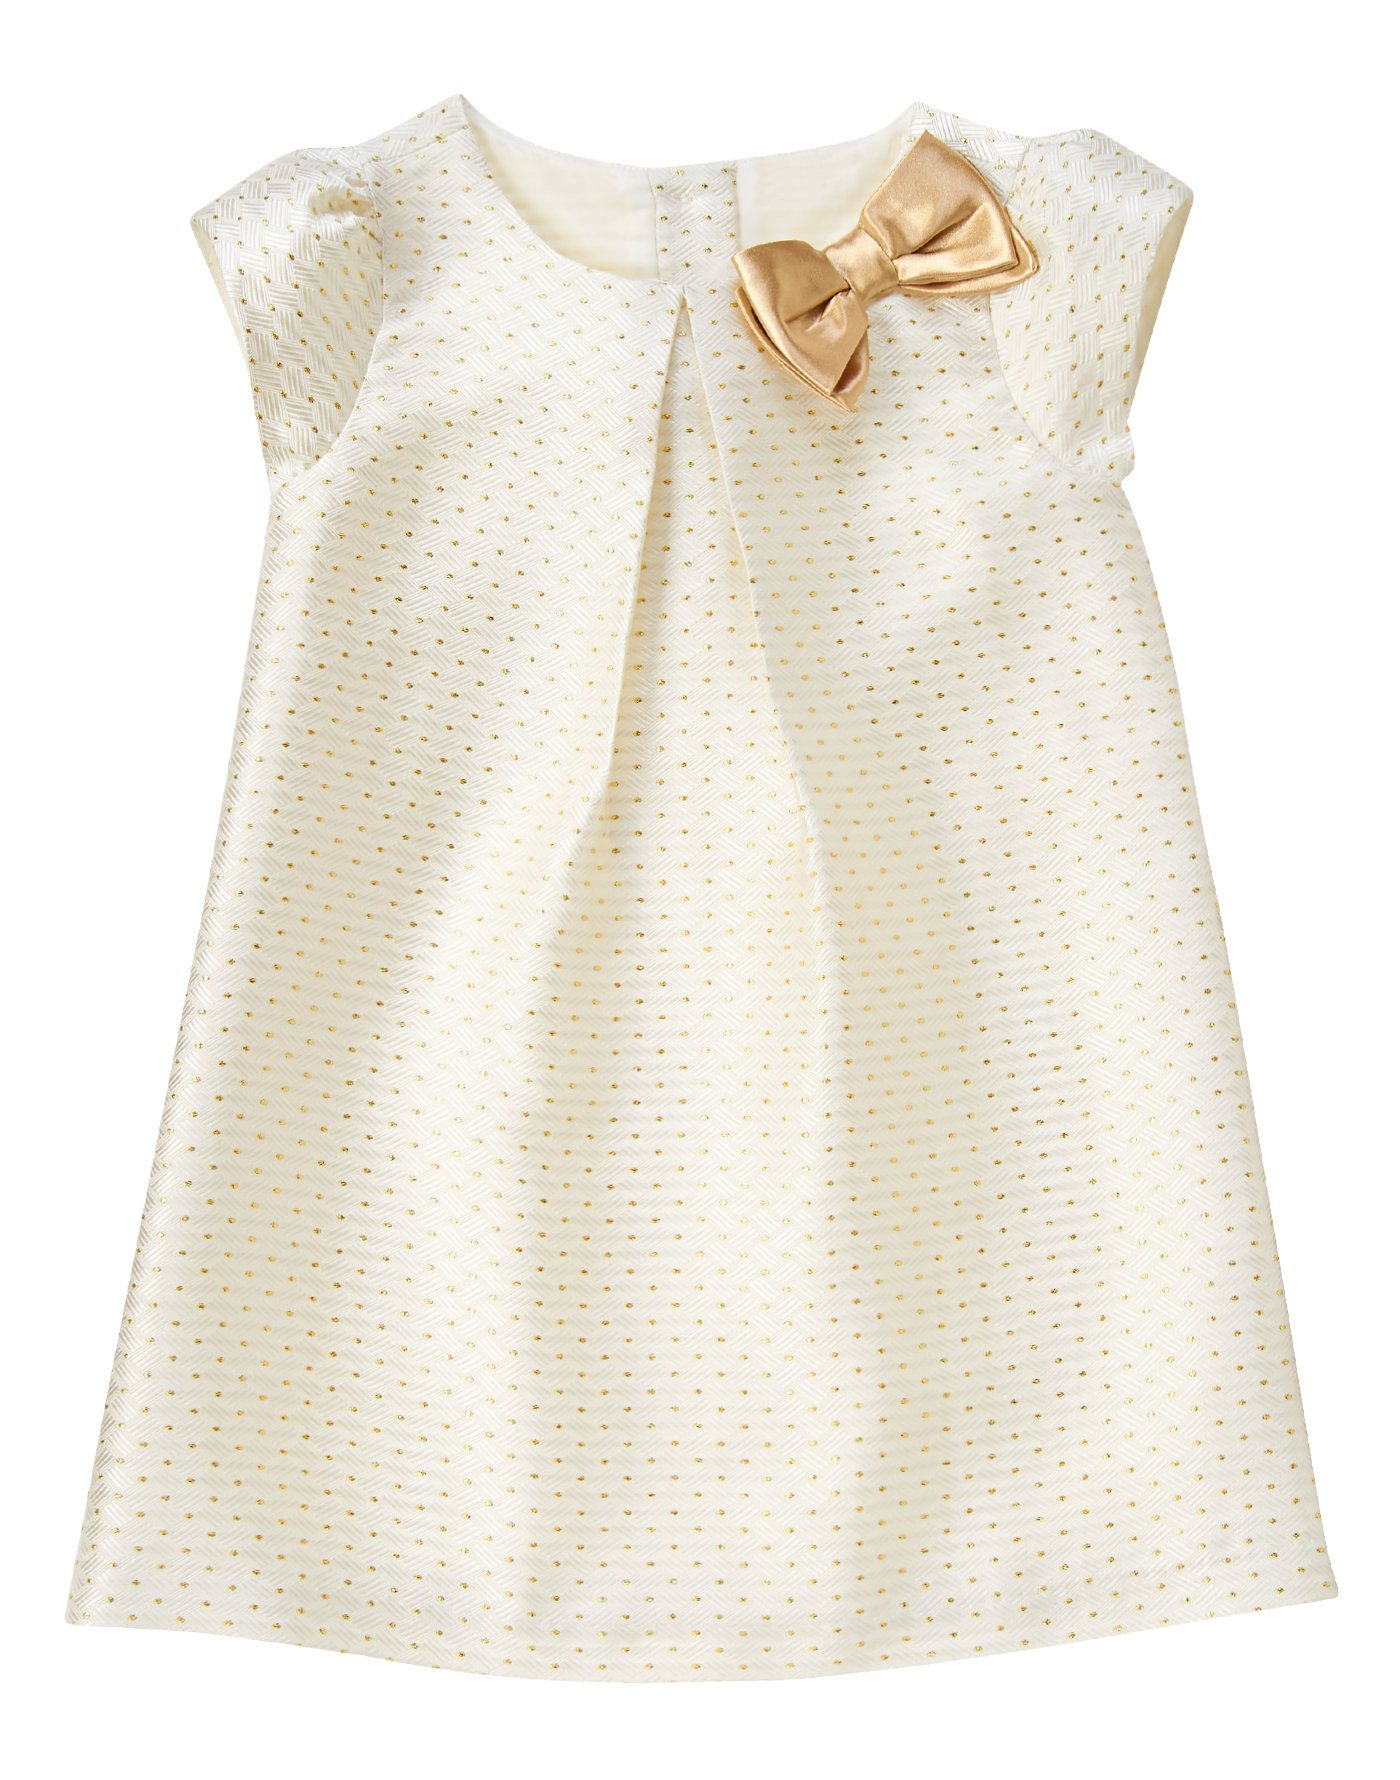 403ea176f2e4 Gold Dot Jacquard Dress at Gymboree | baby girl dresses | Toddler ...